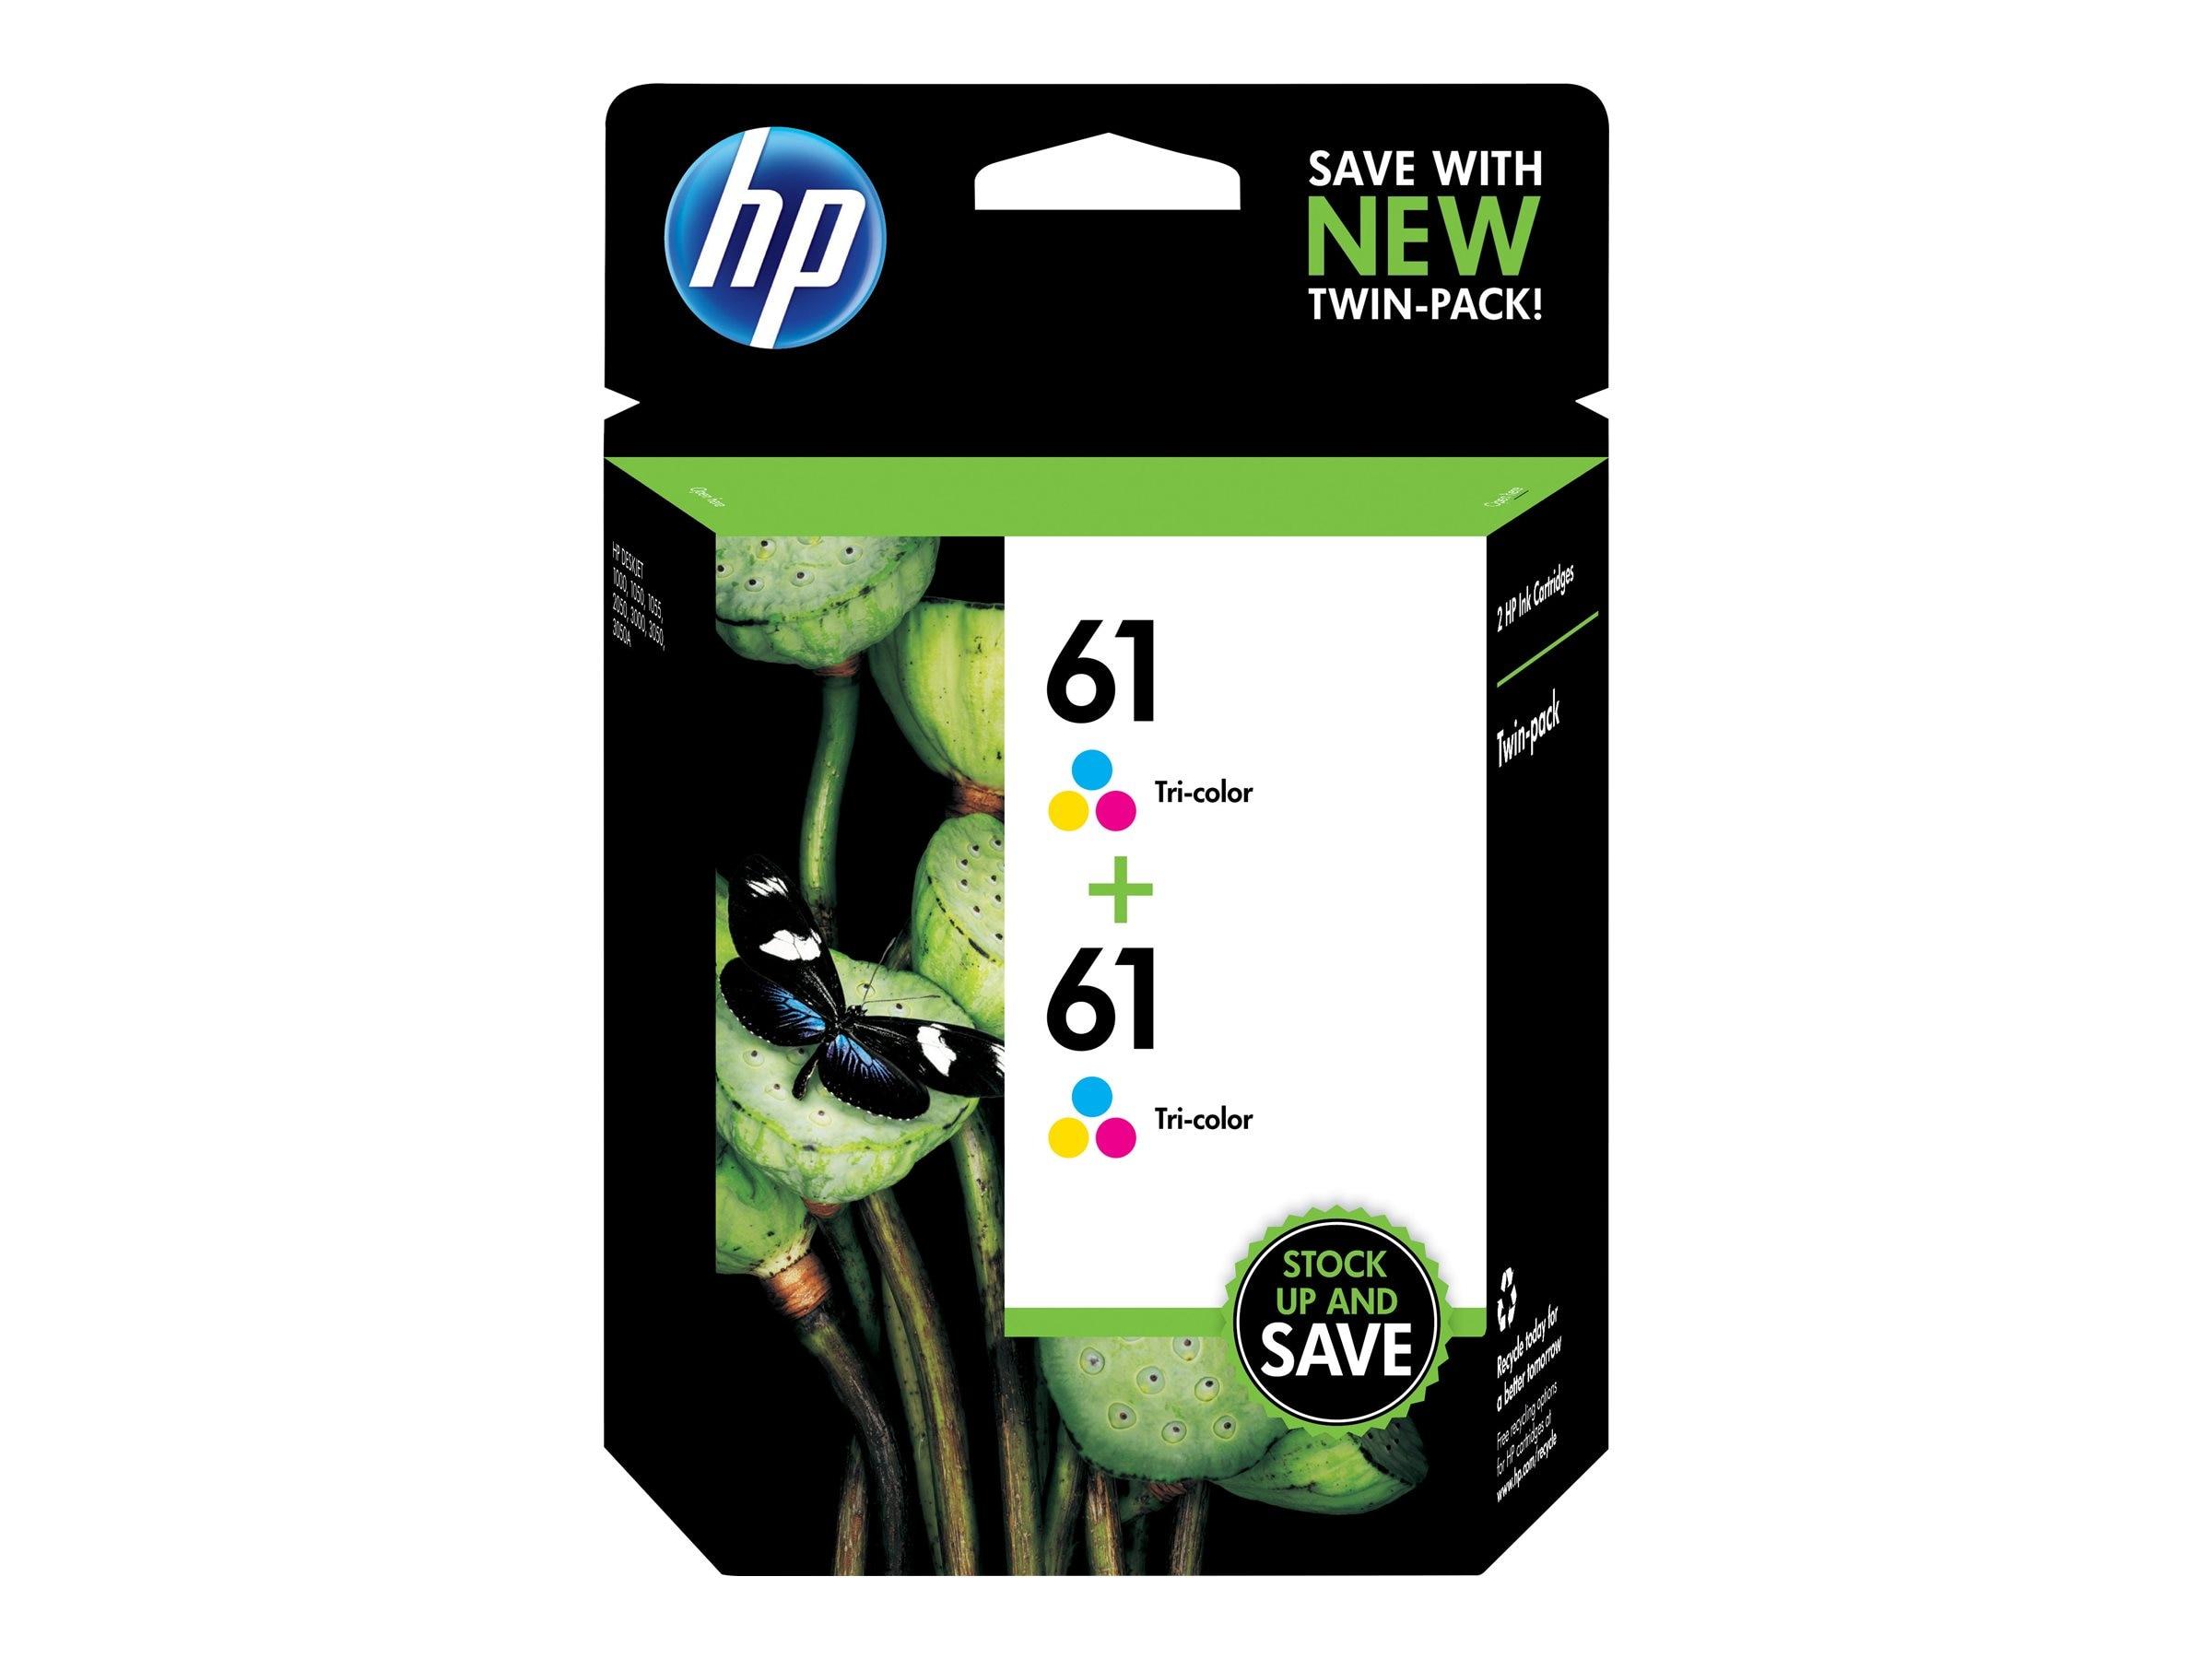 HP 61 (CZ074FN) 2-pack Tri-color Original Ink Cartridges